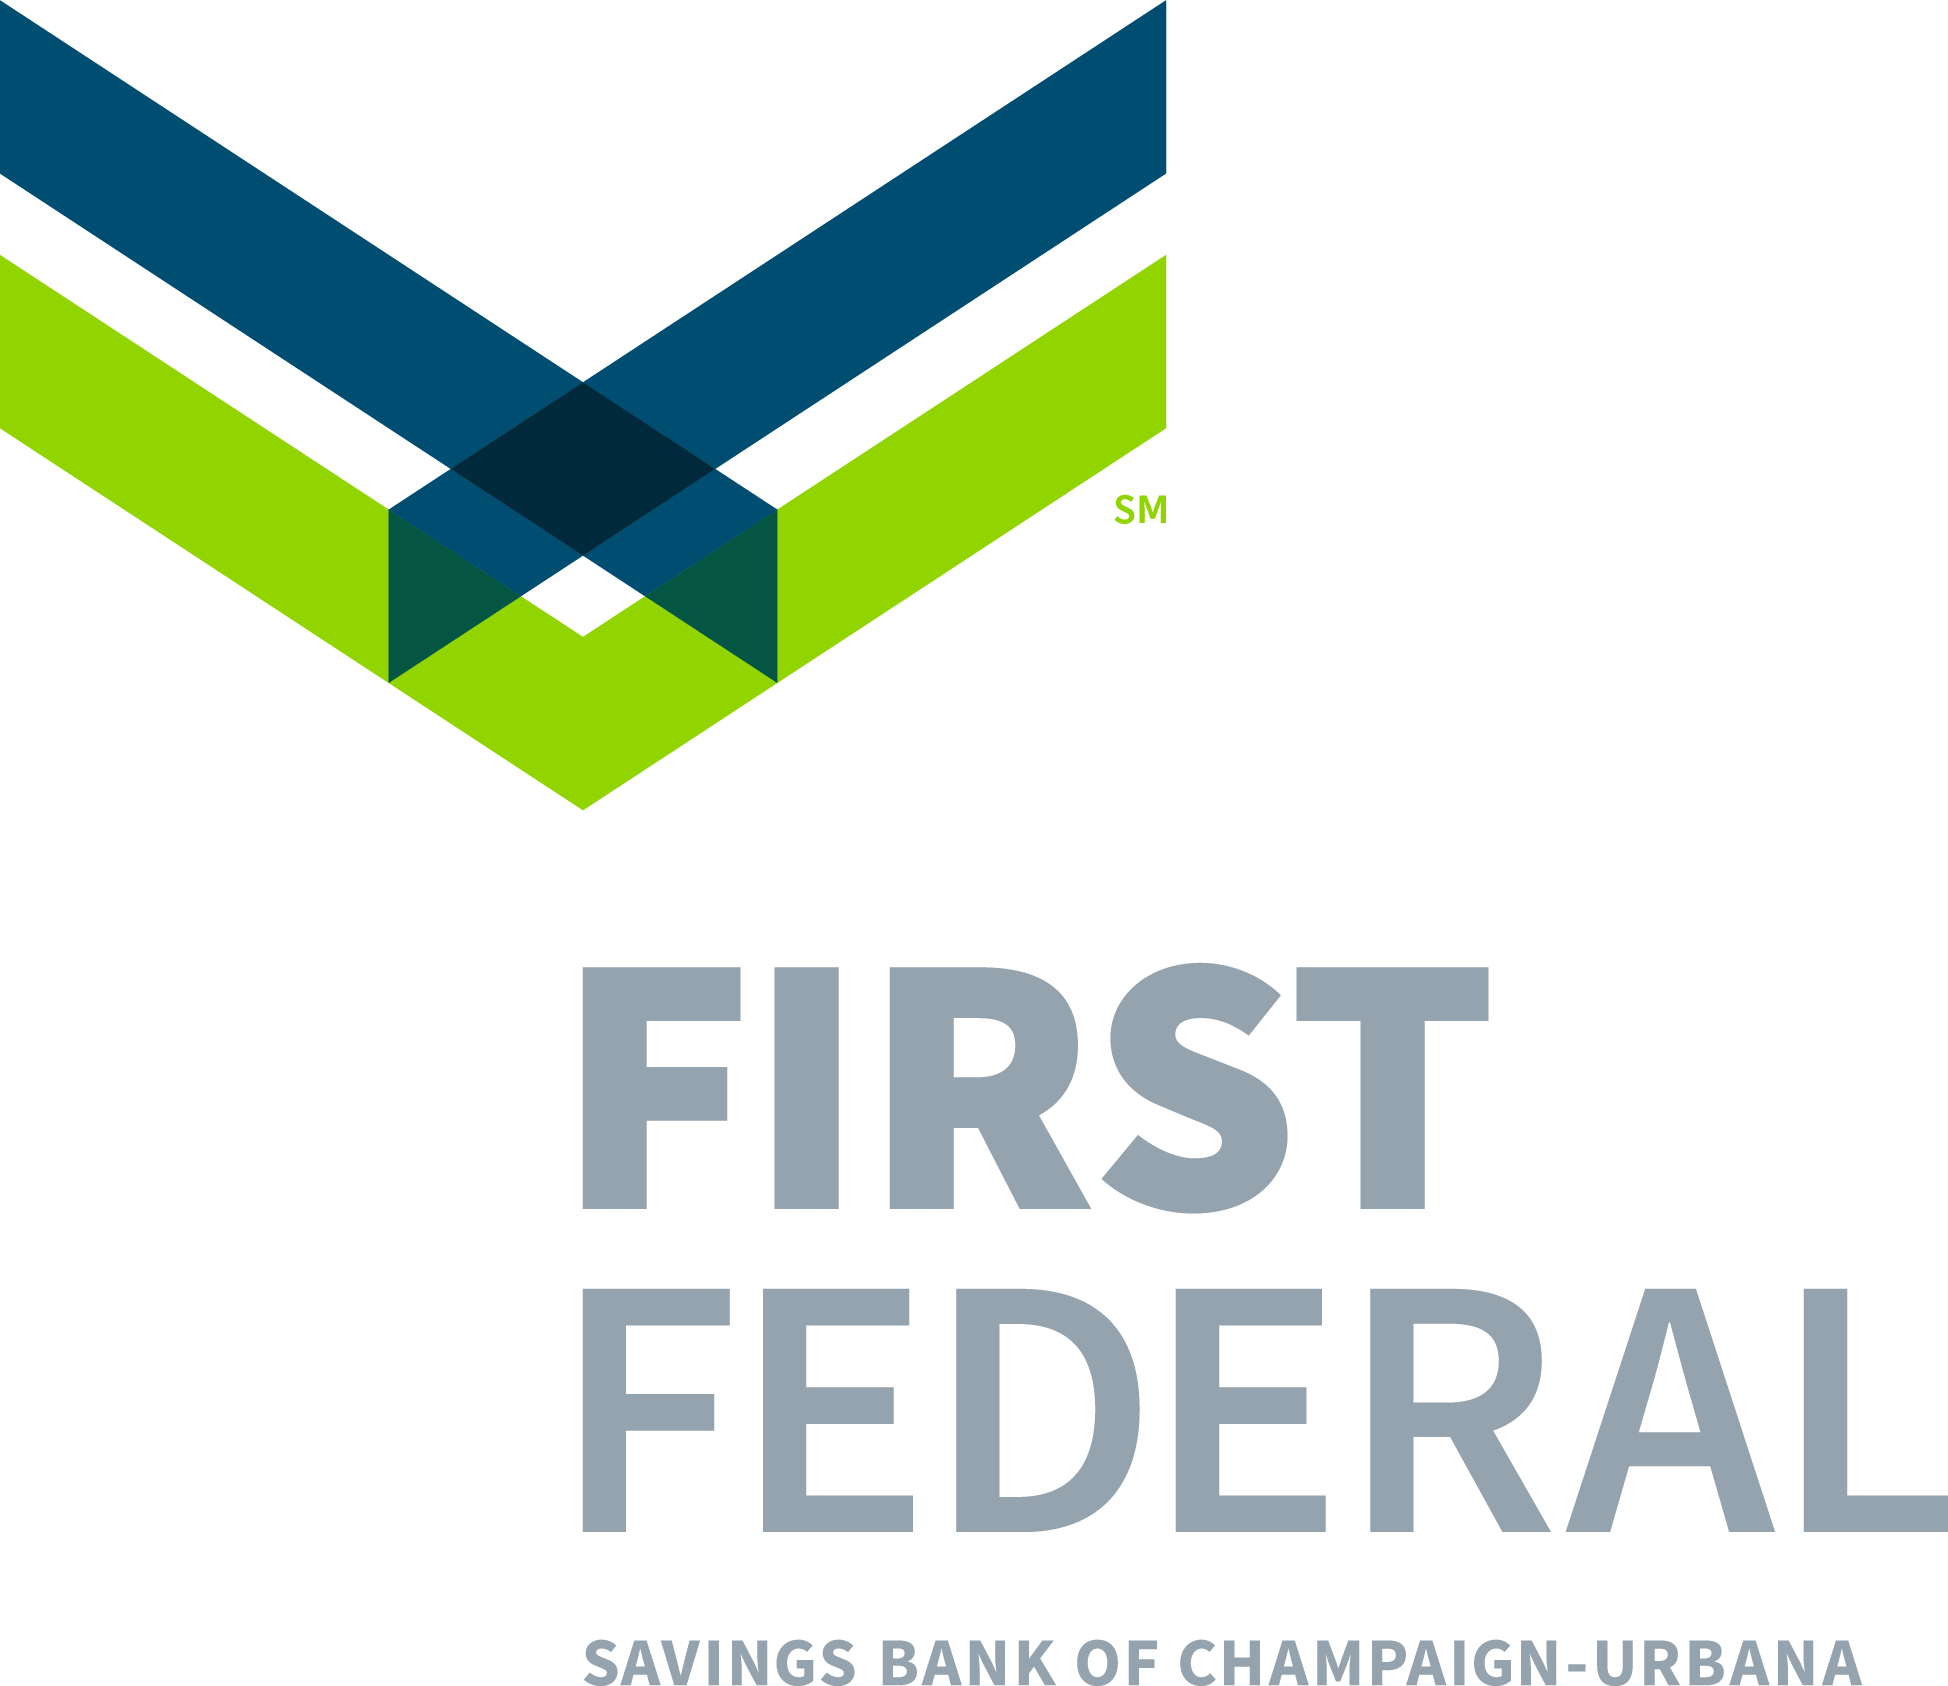 First Federal Savings Bank of Champaign-Urbana - Logo